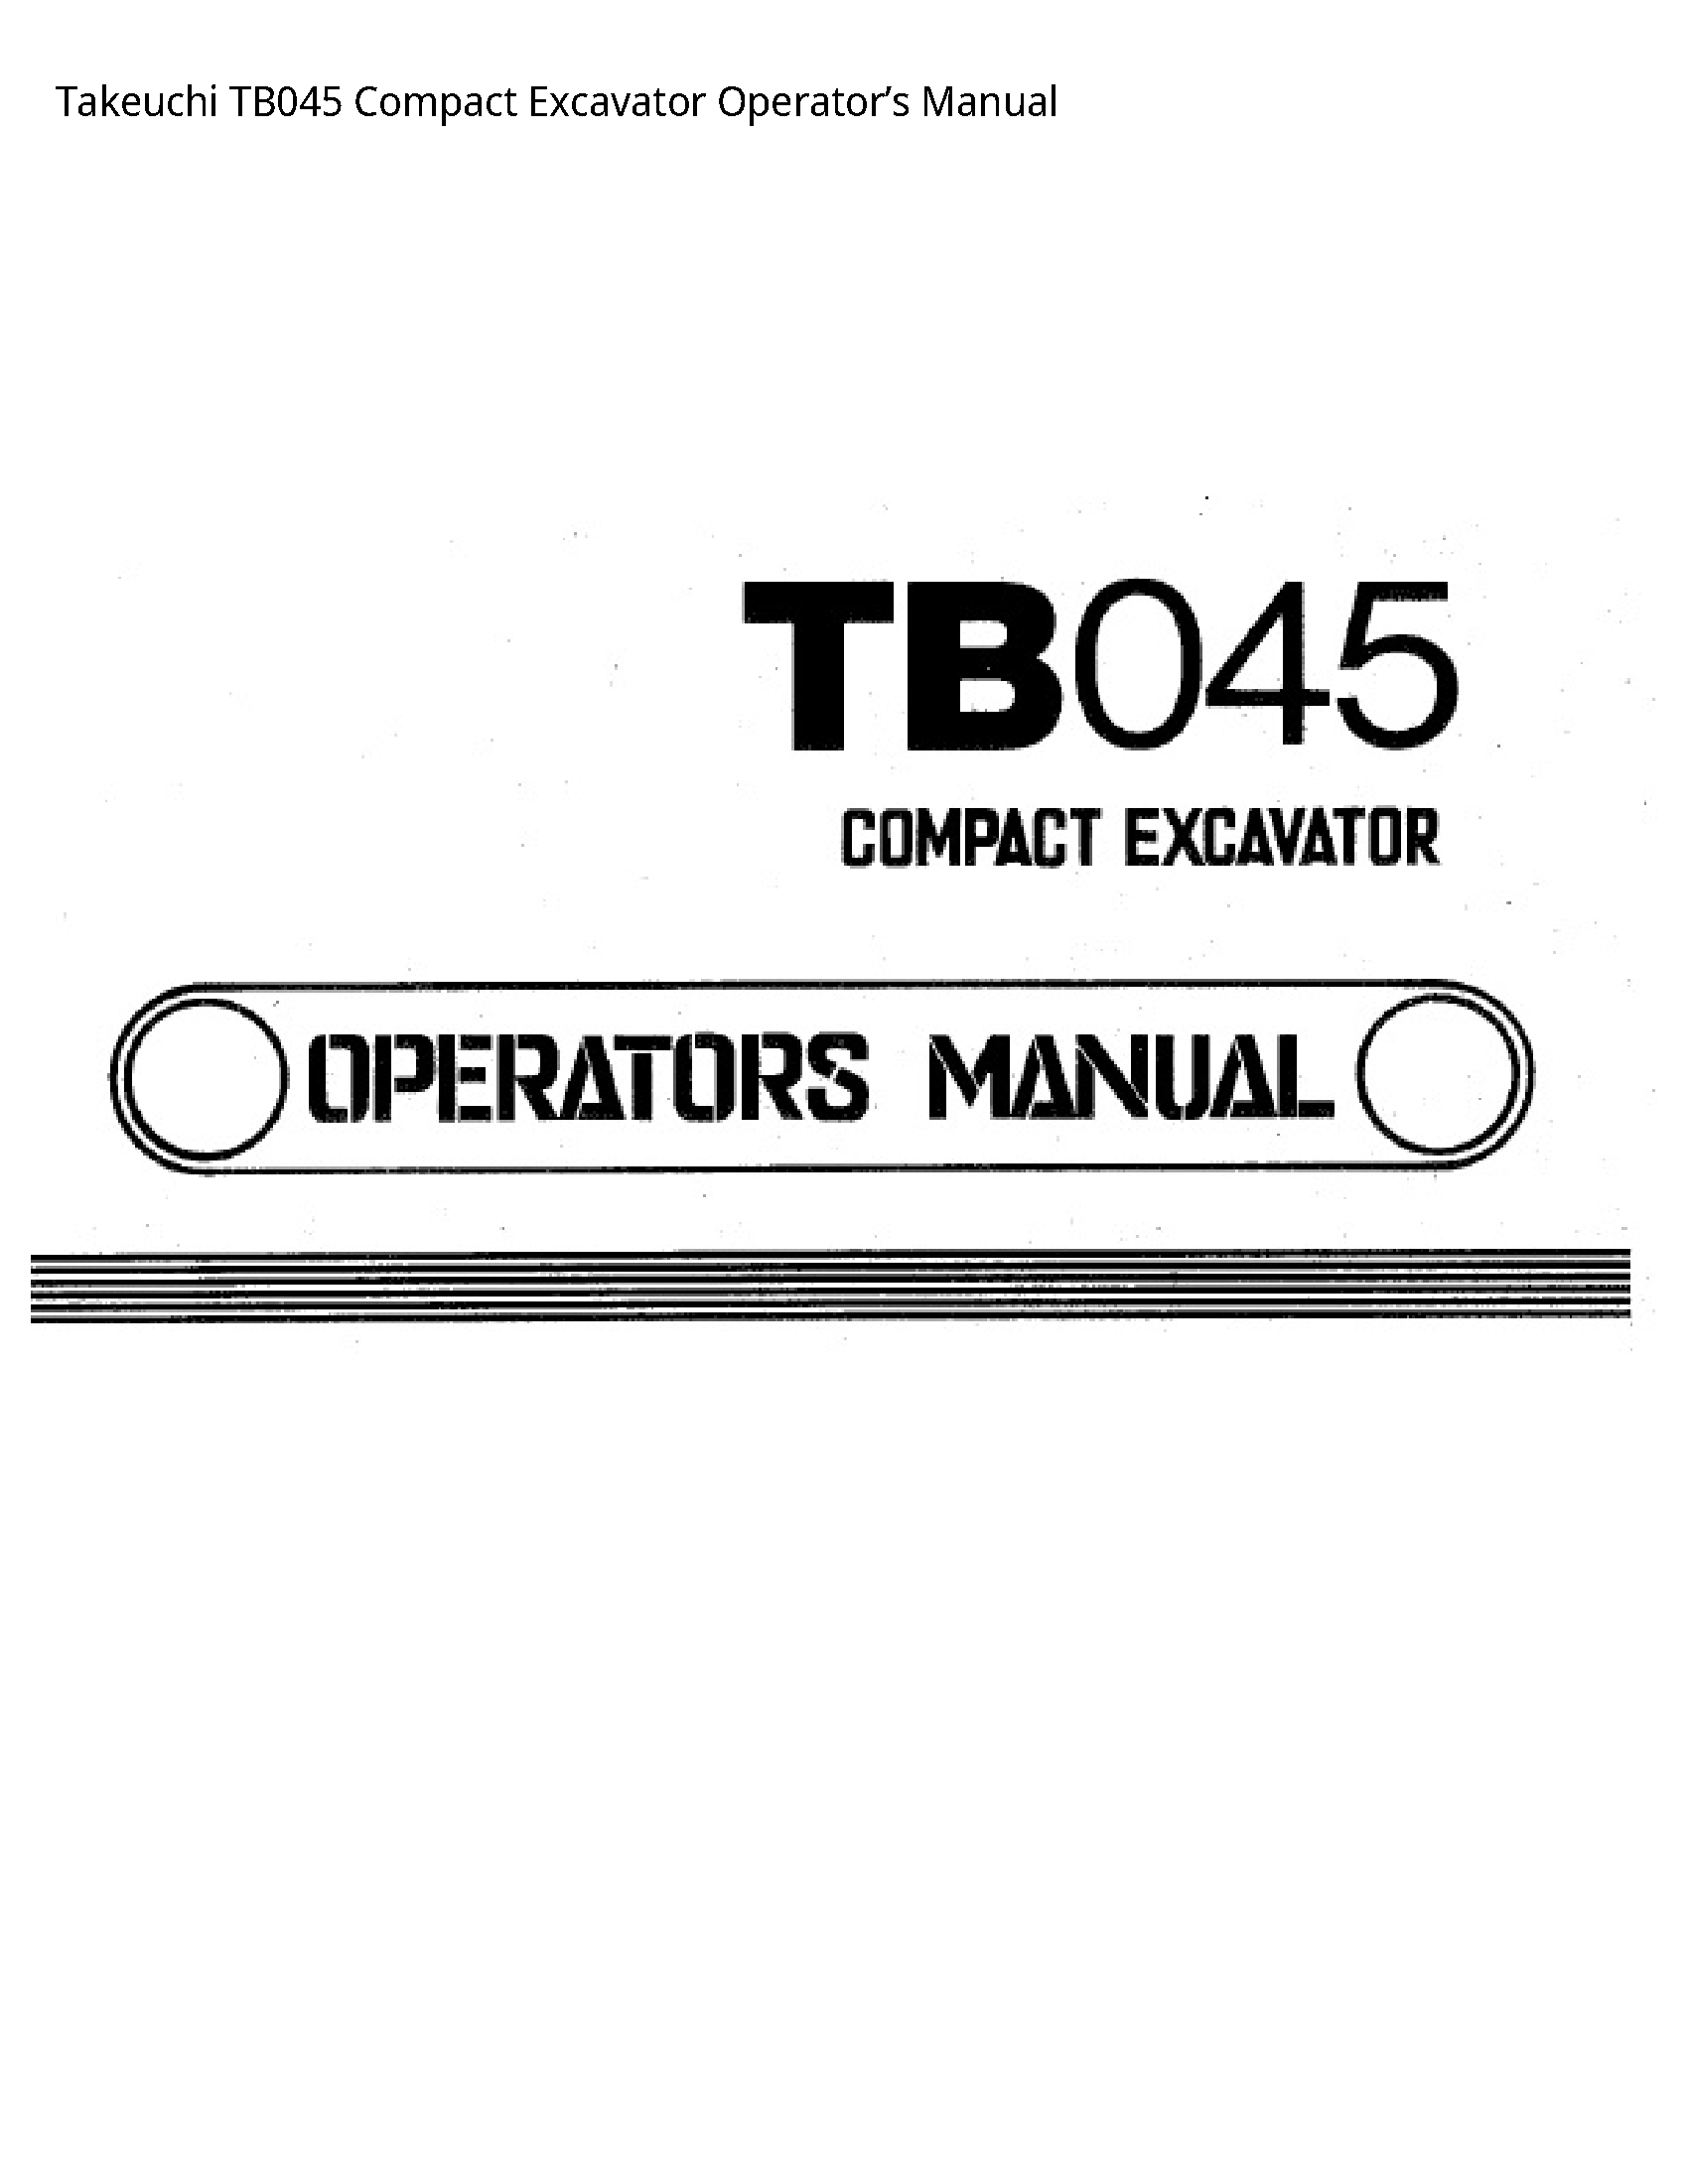 Takeuchi TB045 Compact Excavator Operator's manual